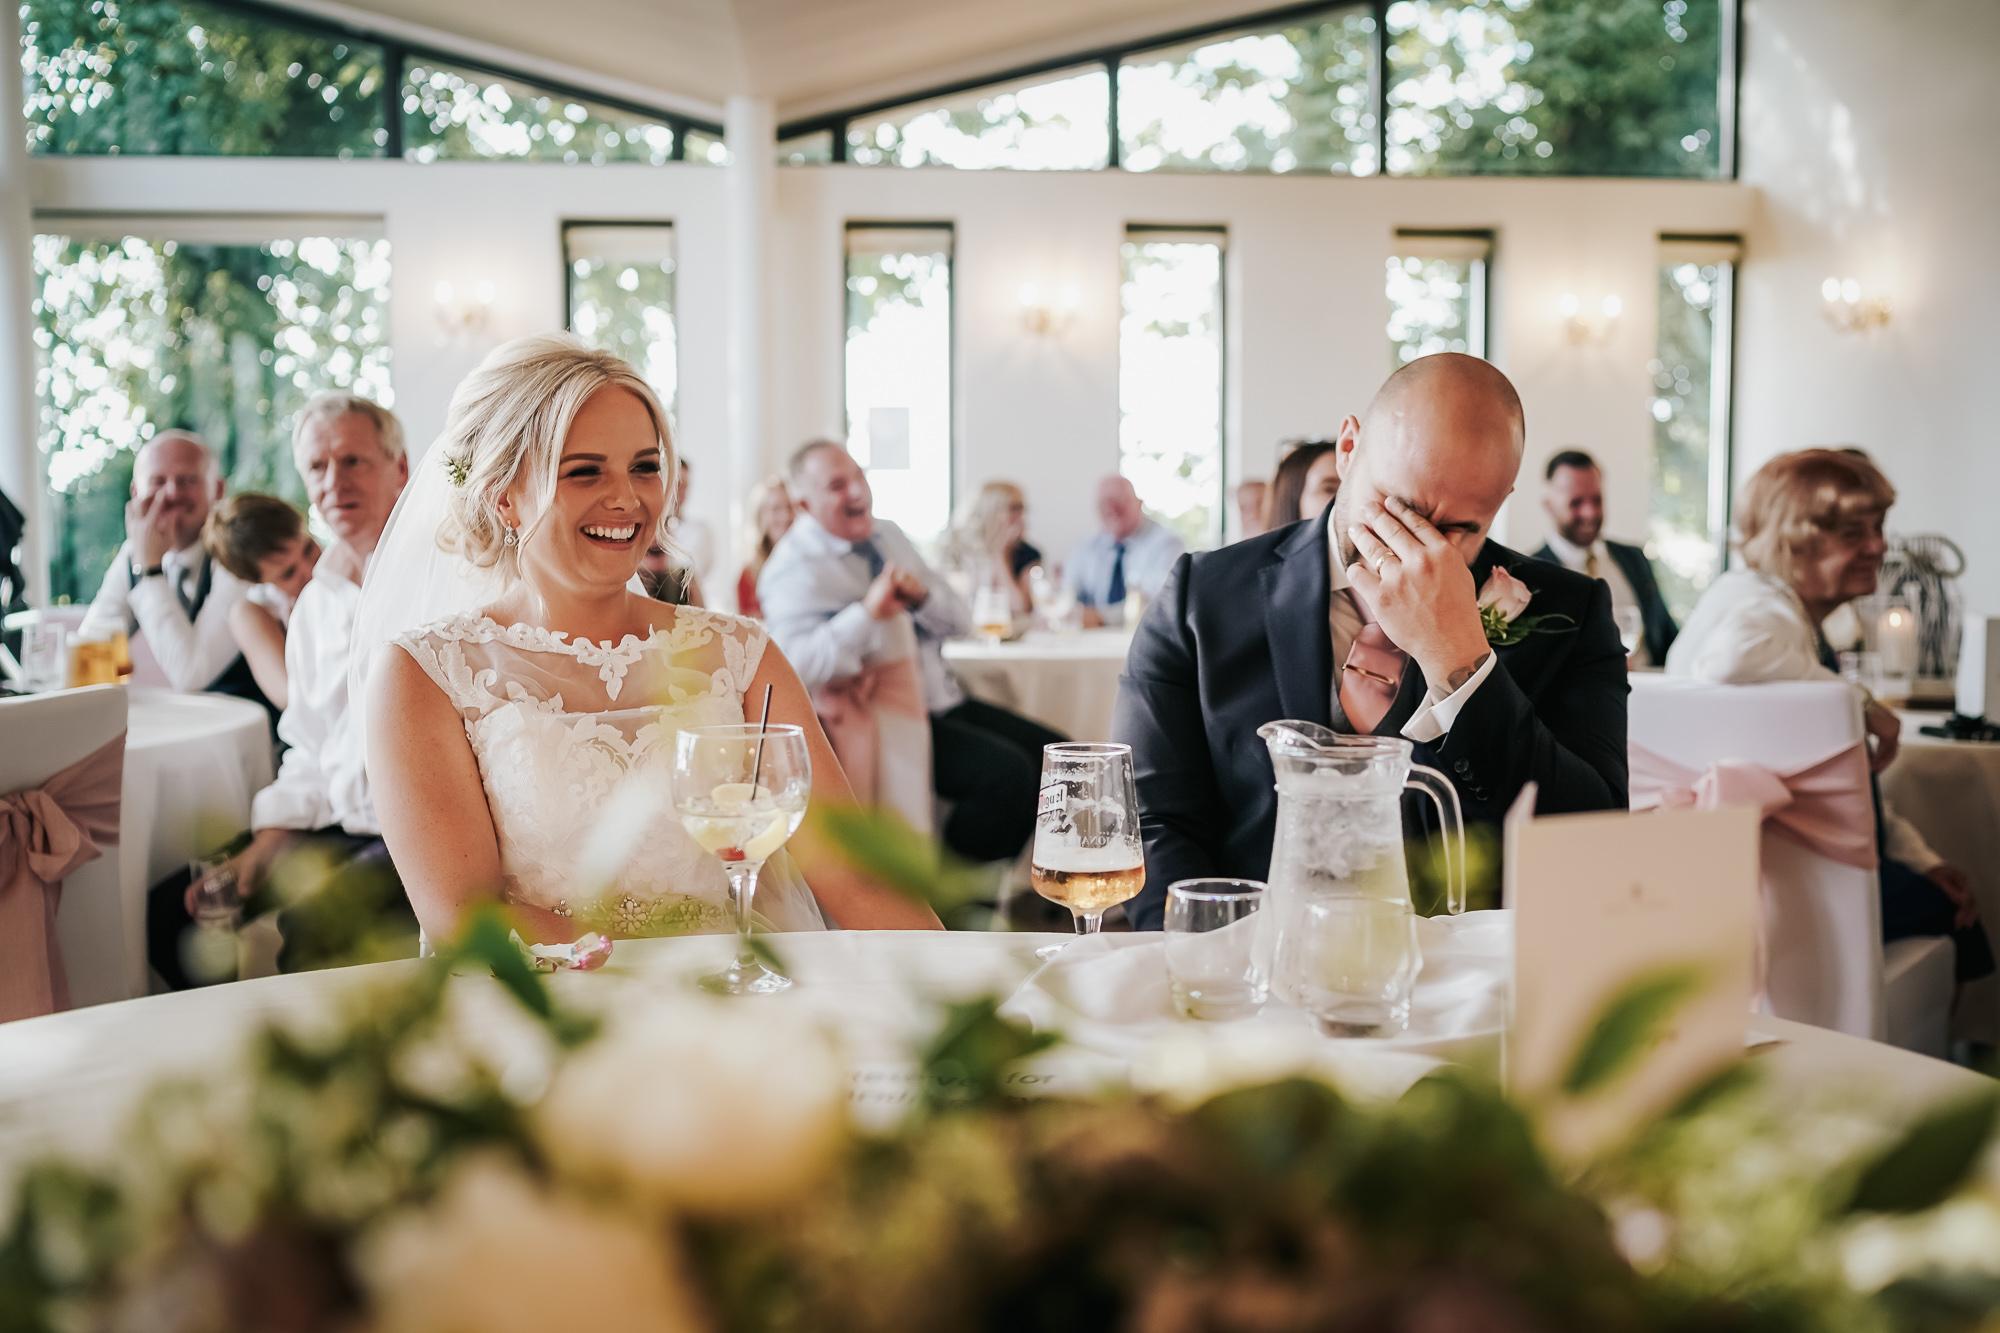 West Tower Wedding Photographer Ormskirk Lancashire wedding photography (44 of 57).jpg